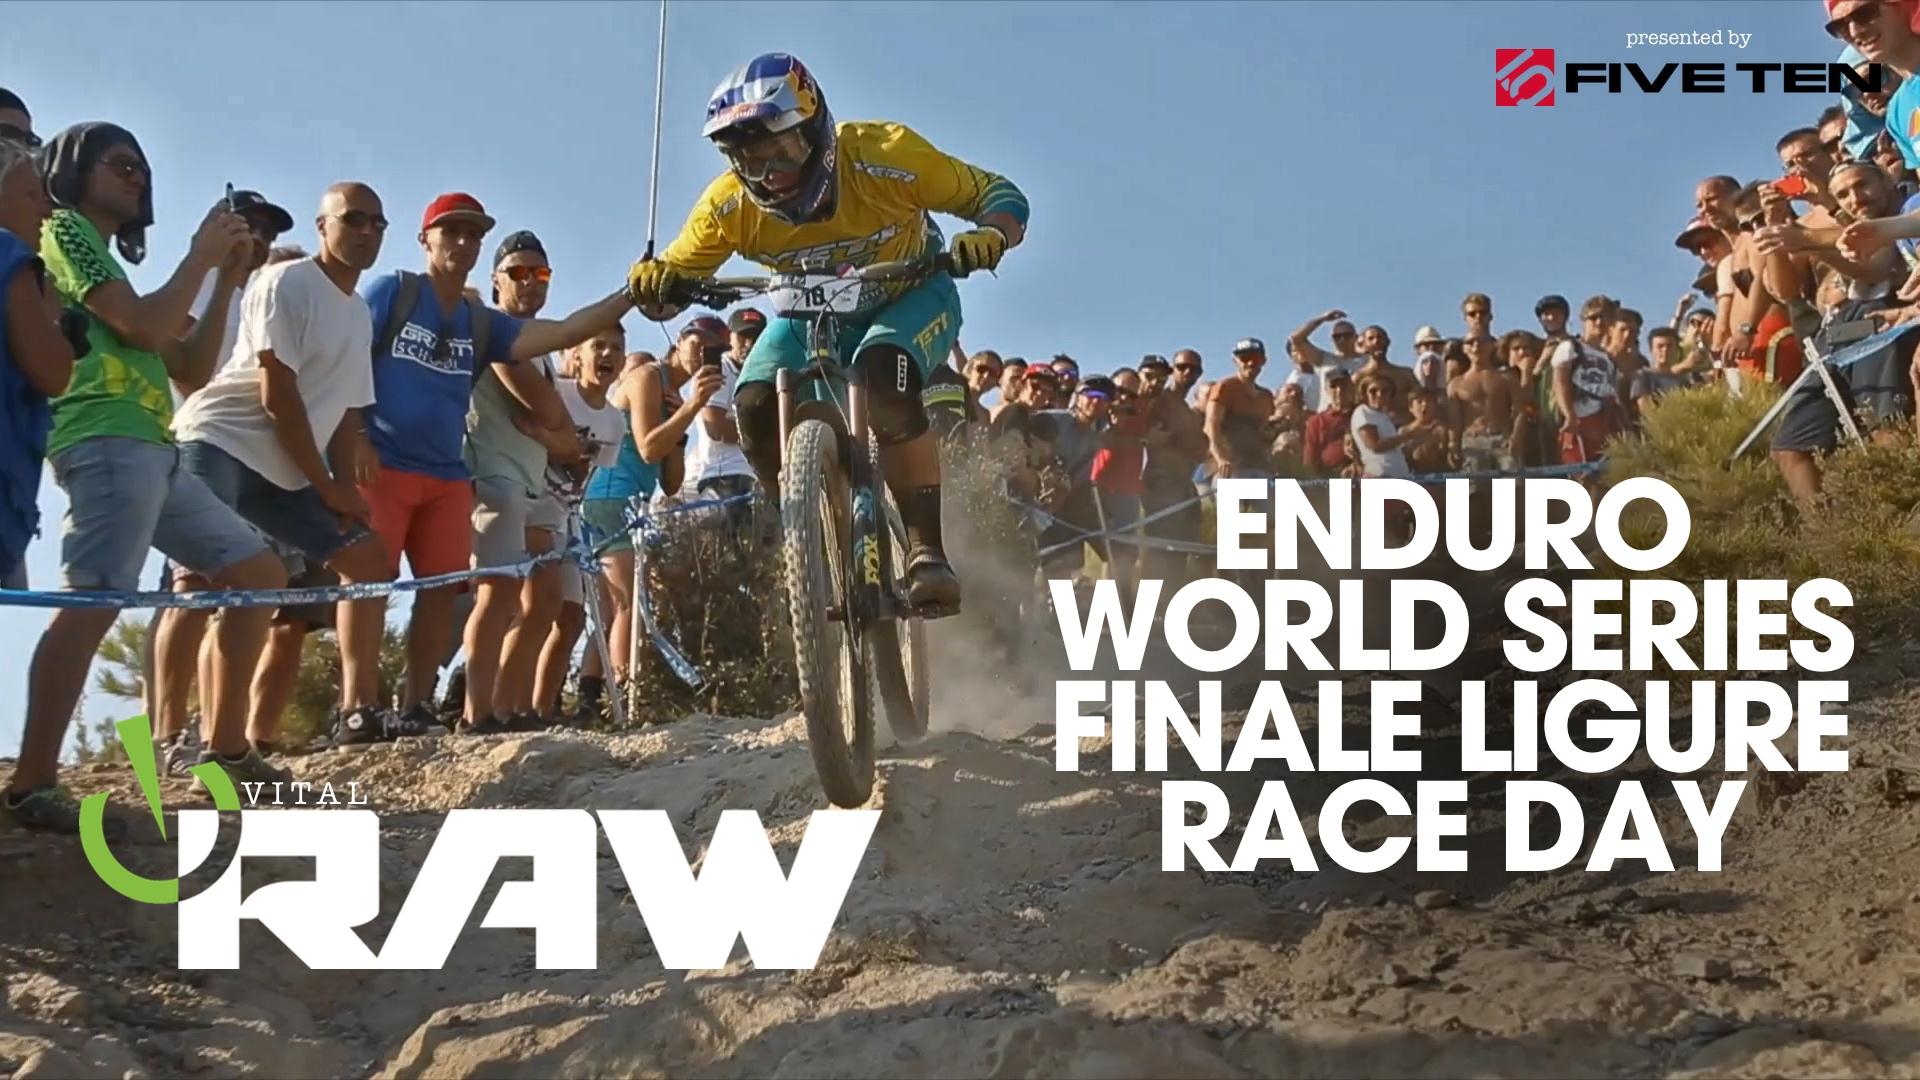 Vital RAW - ENDURO WORLD SERIES RACE DAY - Finale Ligure